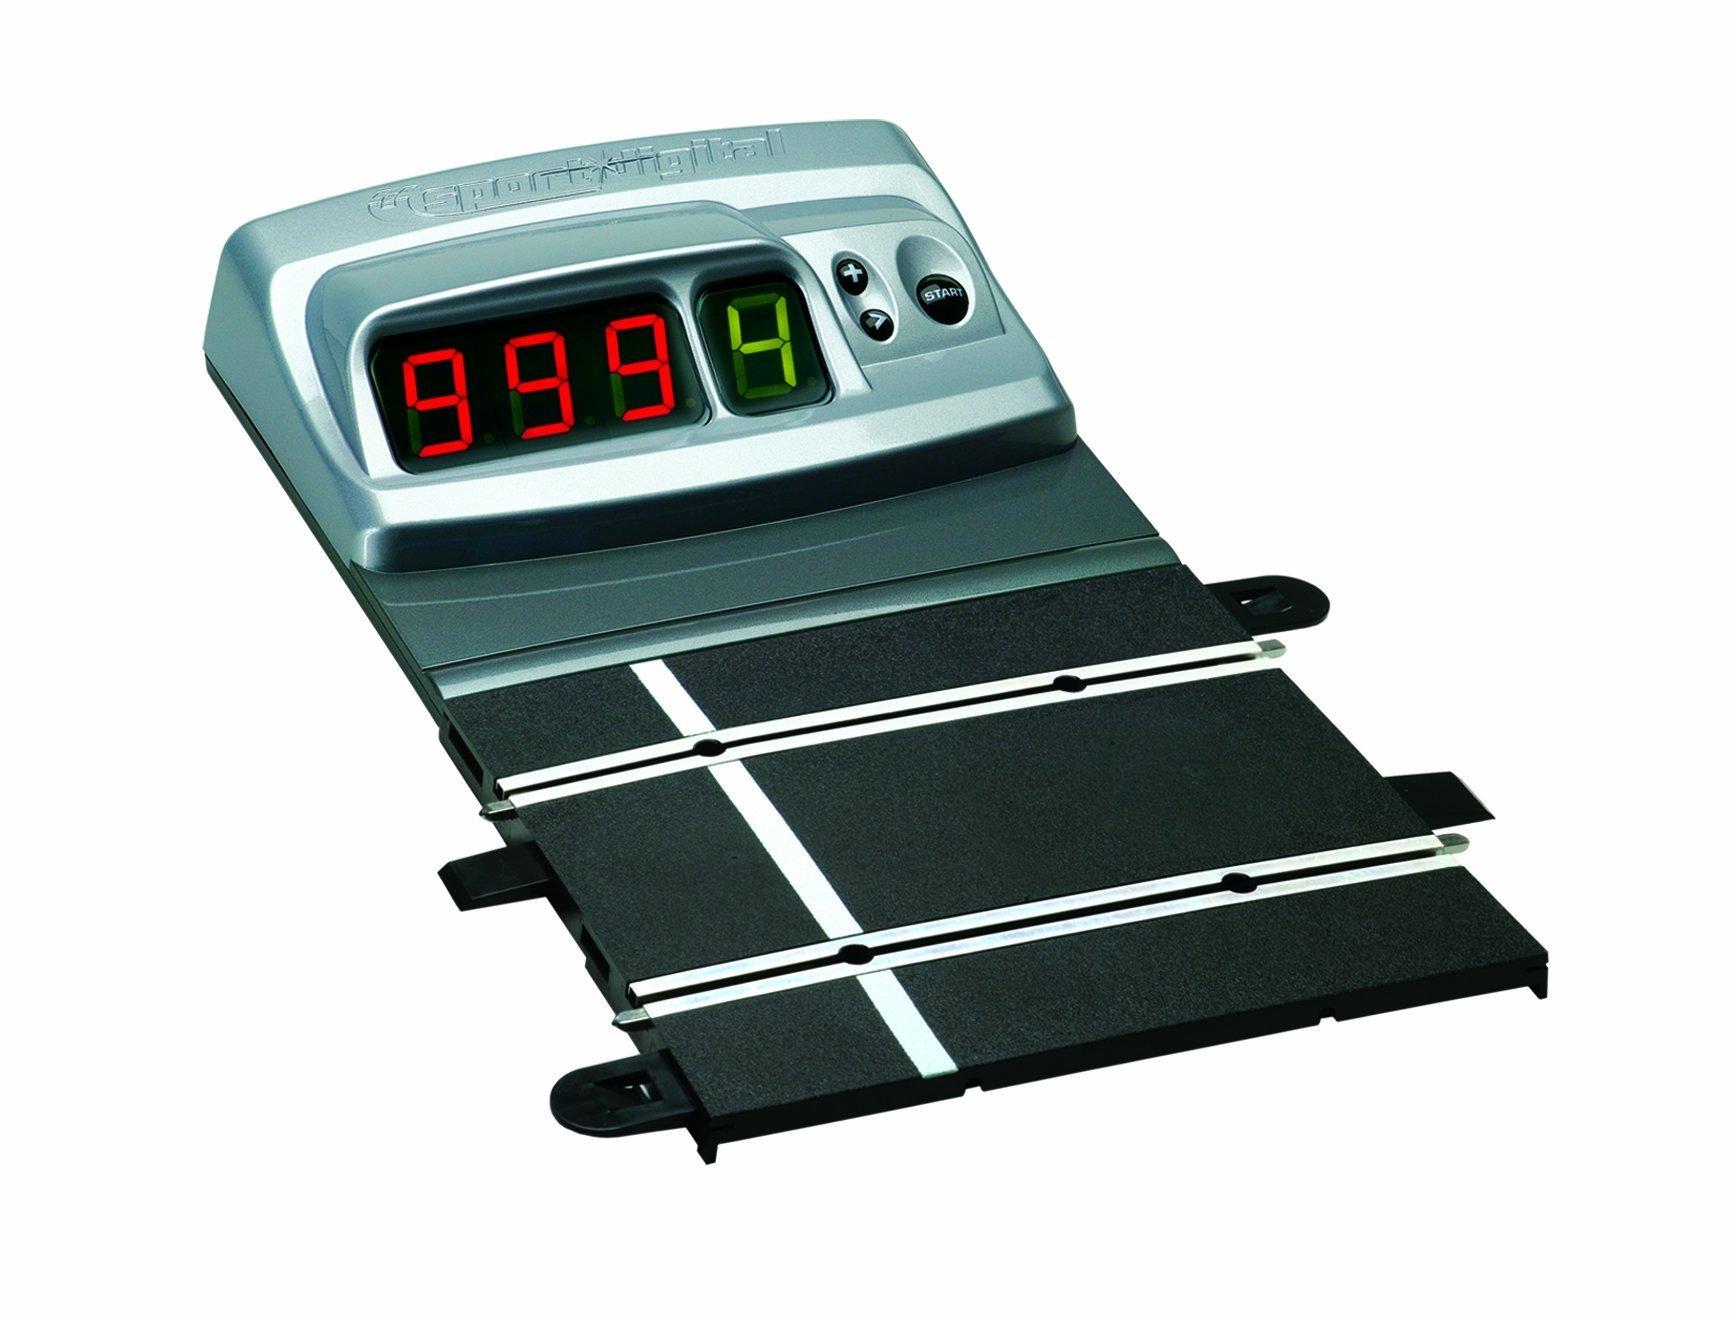 Scalextric C7039 Digital Accessories Lap Counter